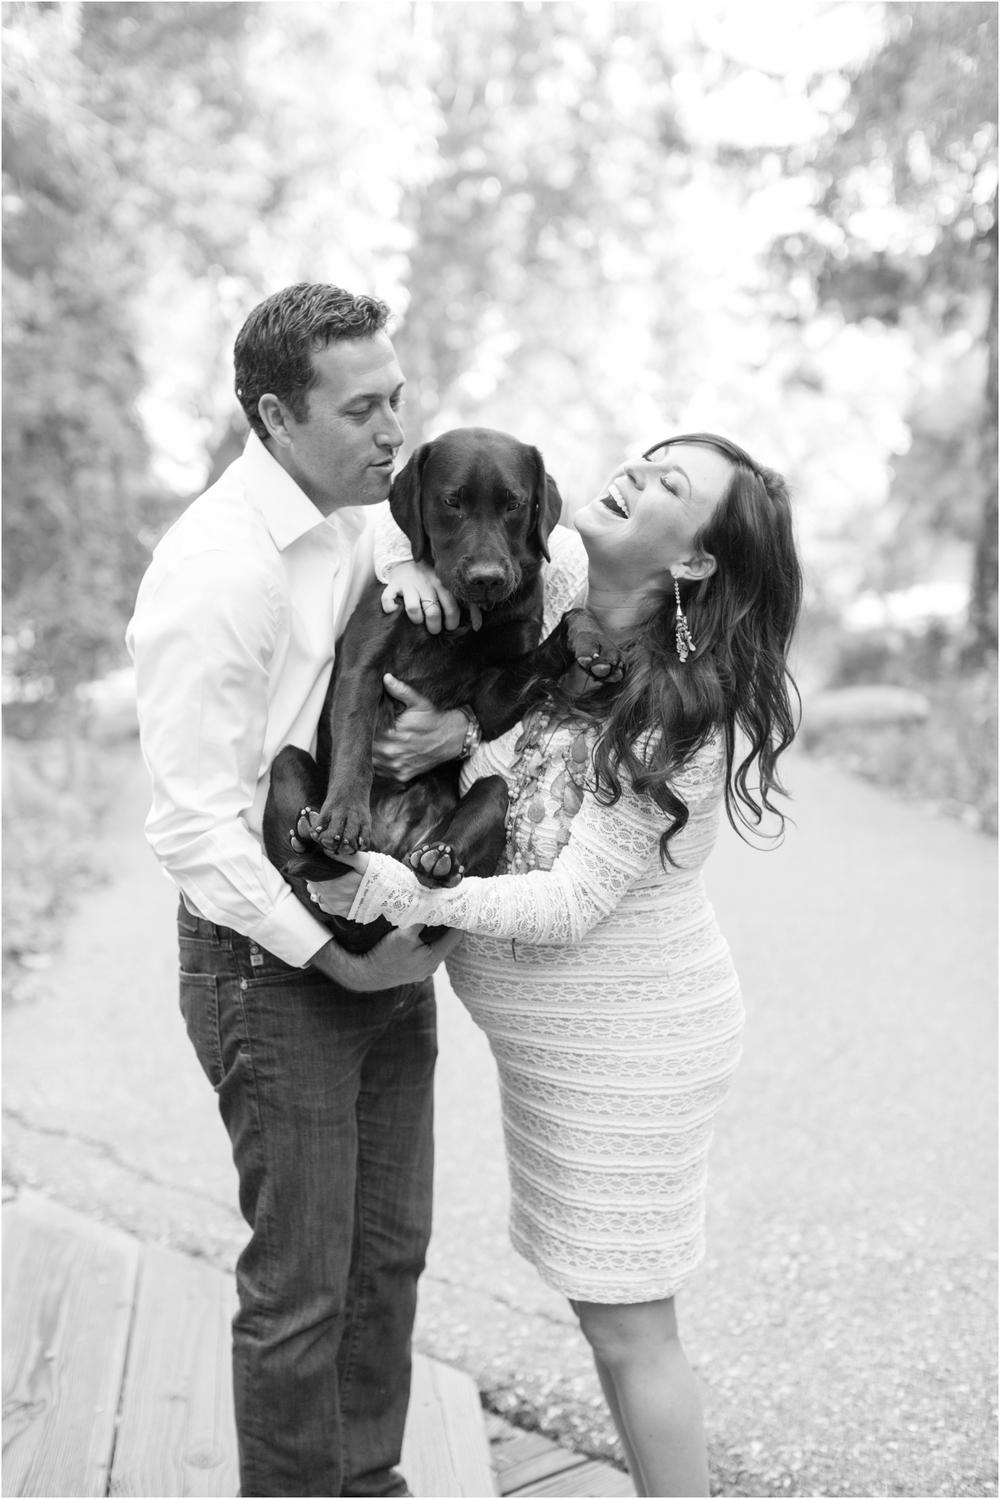 Dos Pueblos Ranch Maternity photos by San Luis Obispo Wedding Photographer Skyla Walton